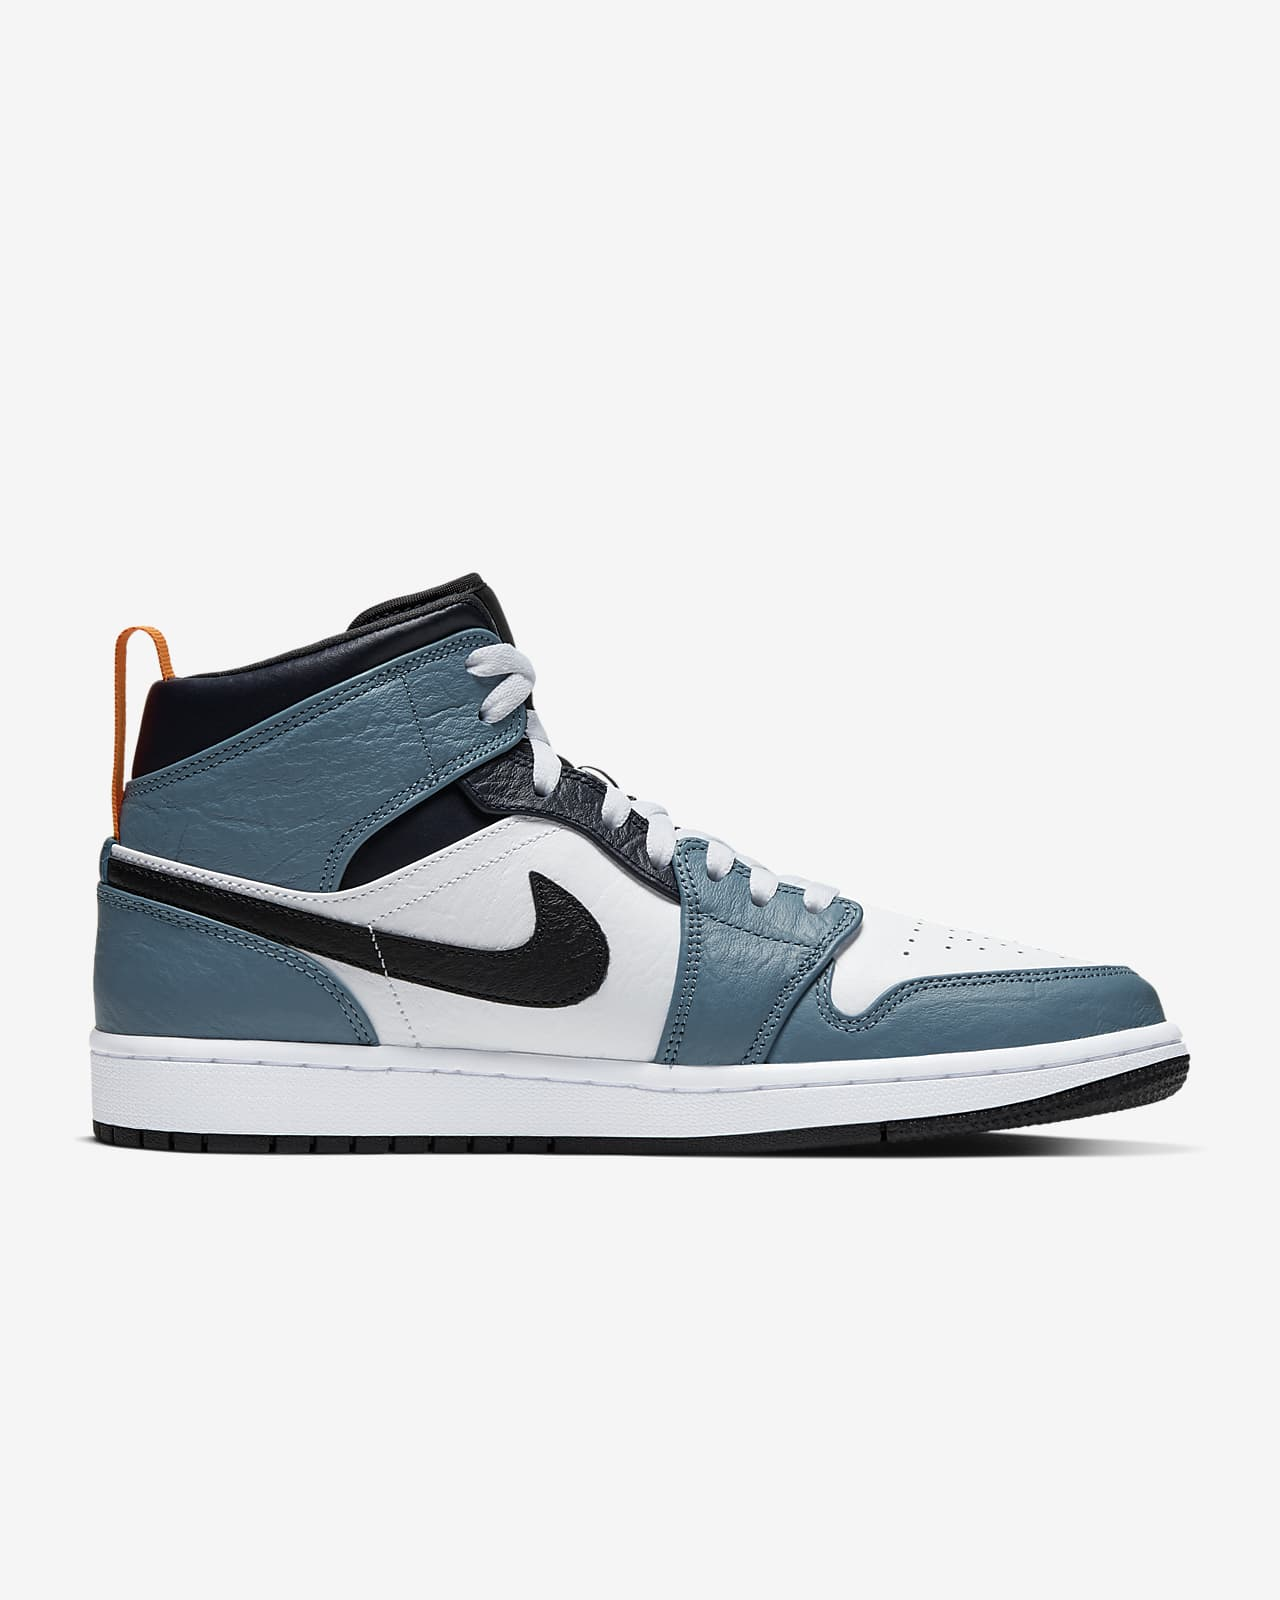 Air Jordan 1 Mid SE Fearless Shoes